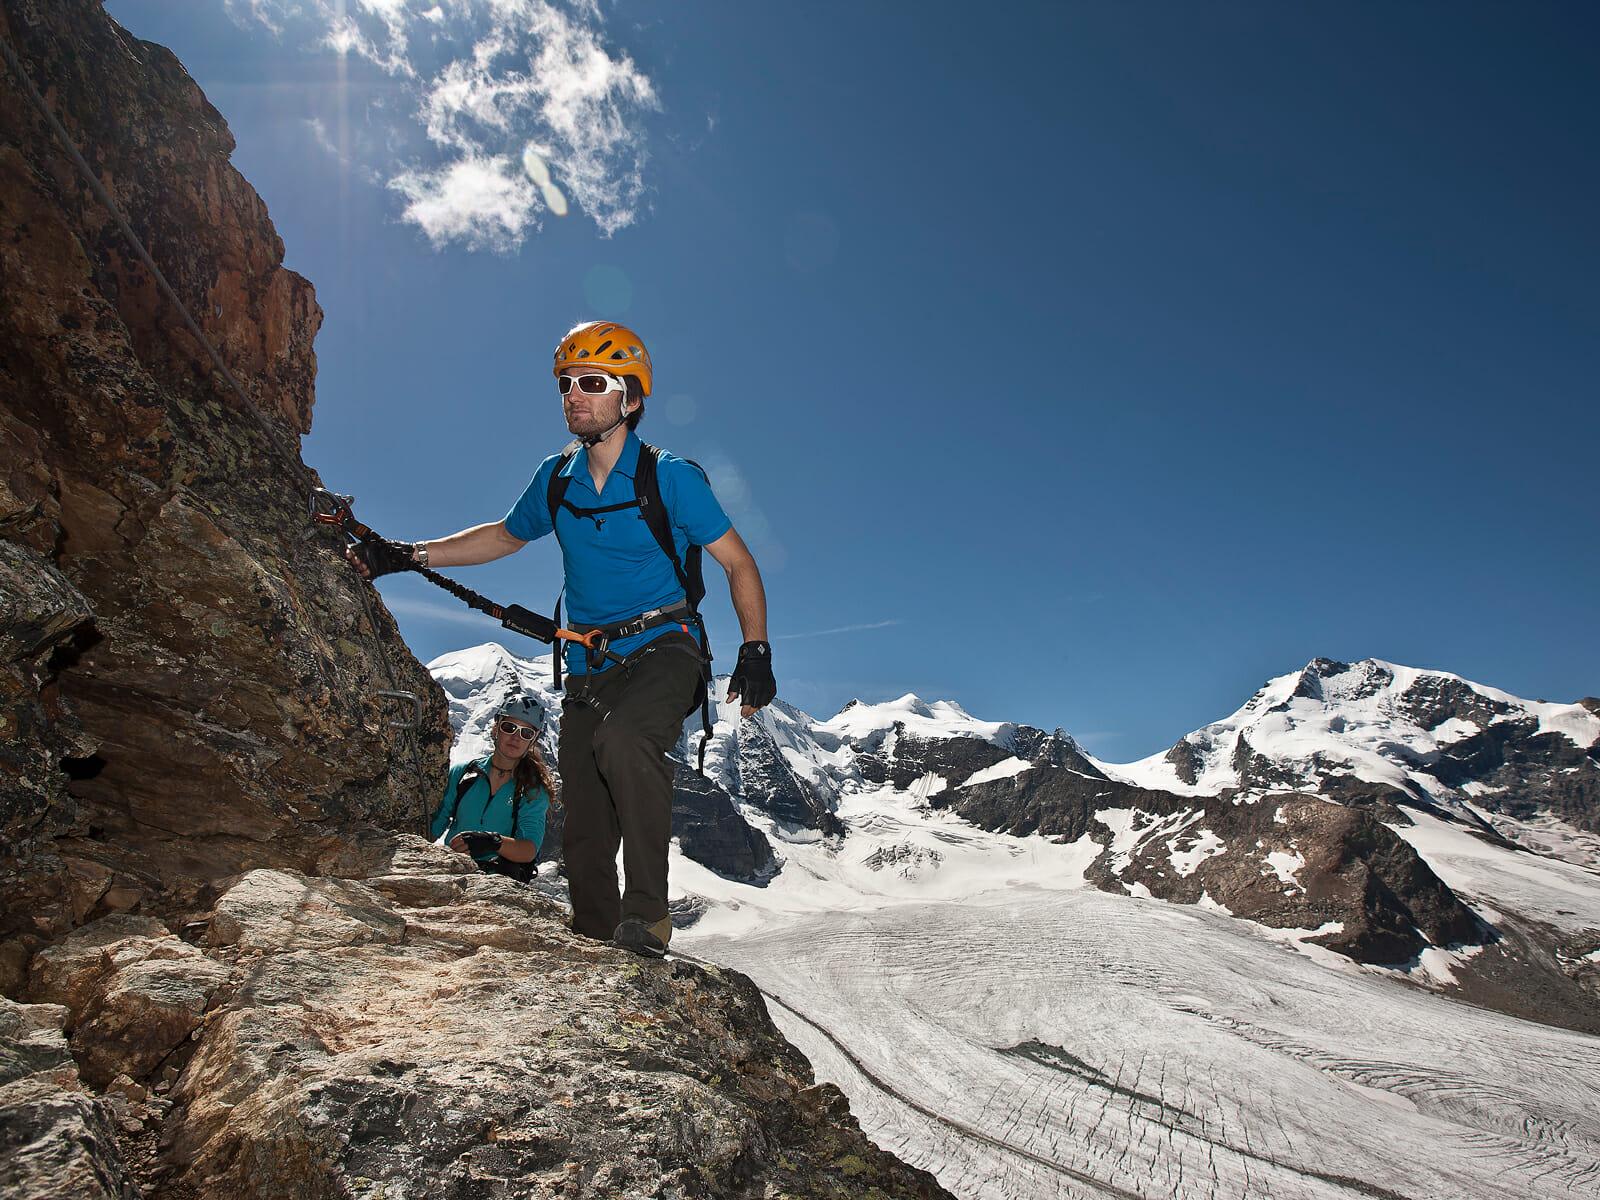 Klettersteig Piz Trovat : Klettersteig piz trovat i bergsteigerschule pontresina